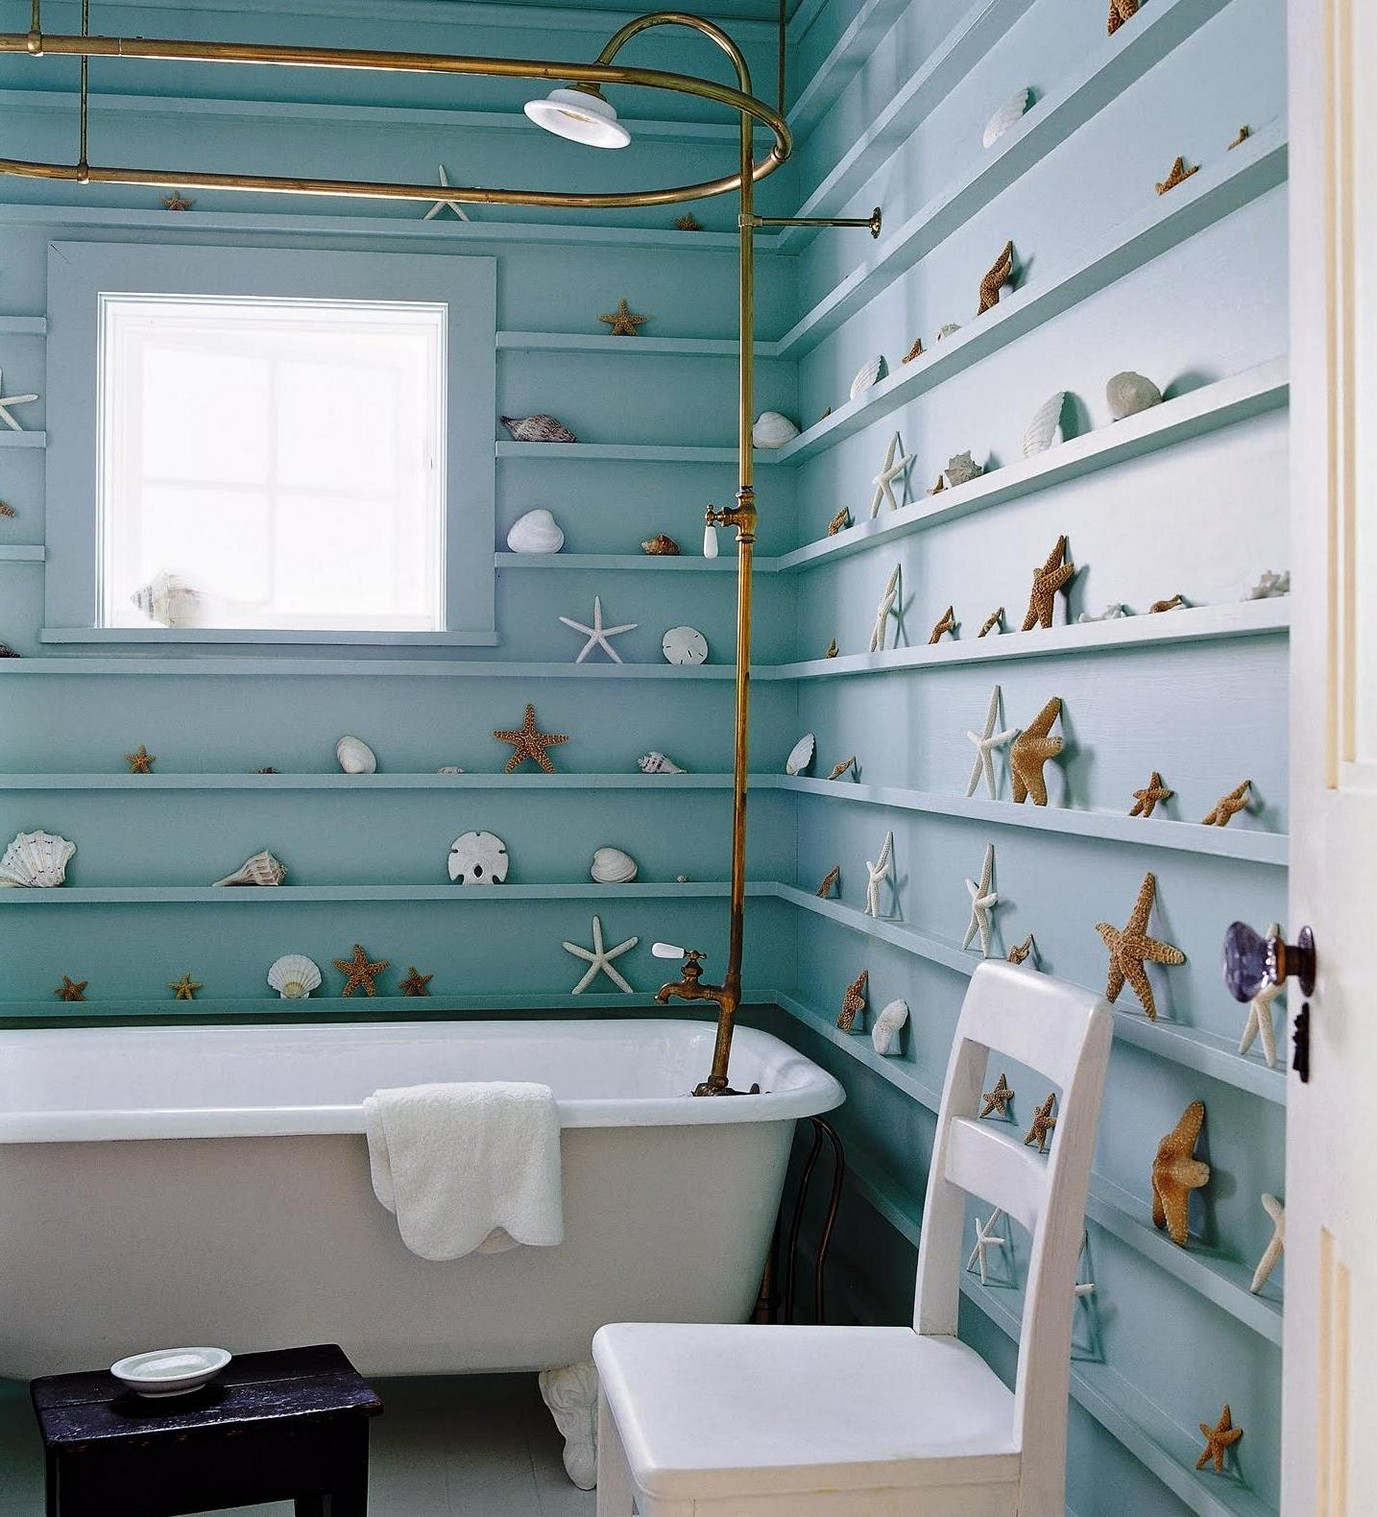 Bathroom Wall Shelves Ideas Creative Bathroom Decoration intended for dimensions 1377 X 1517